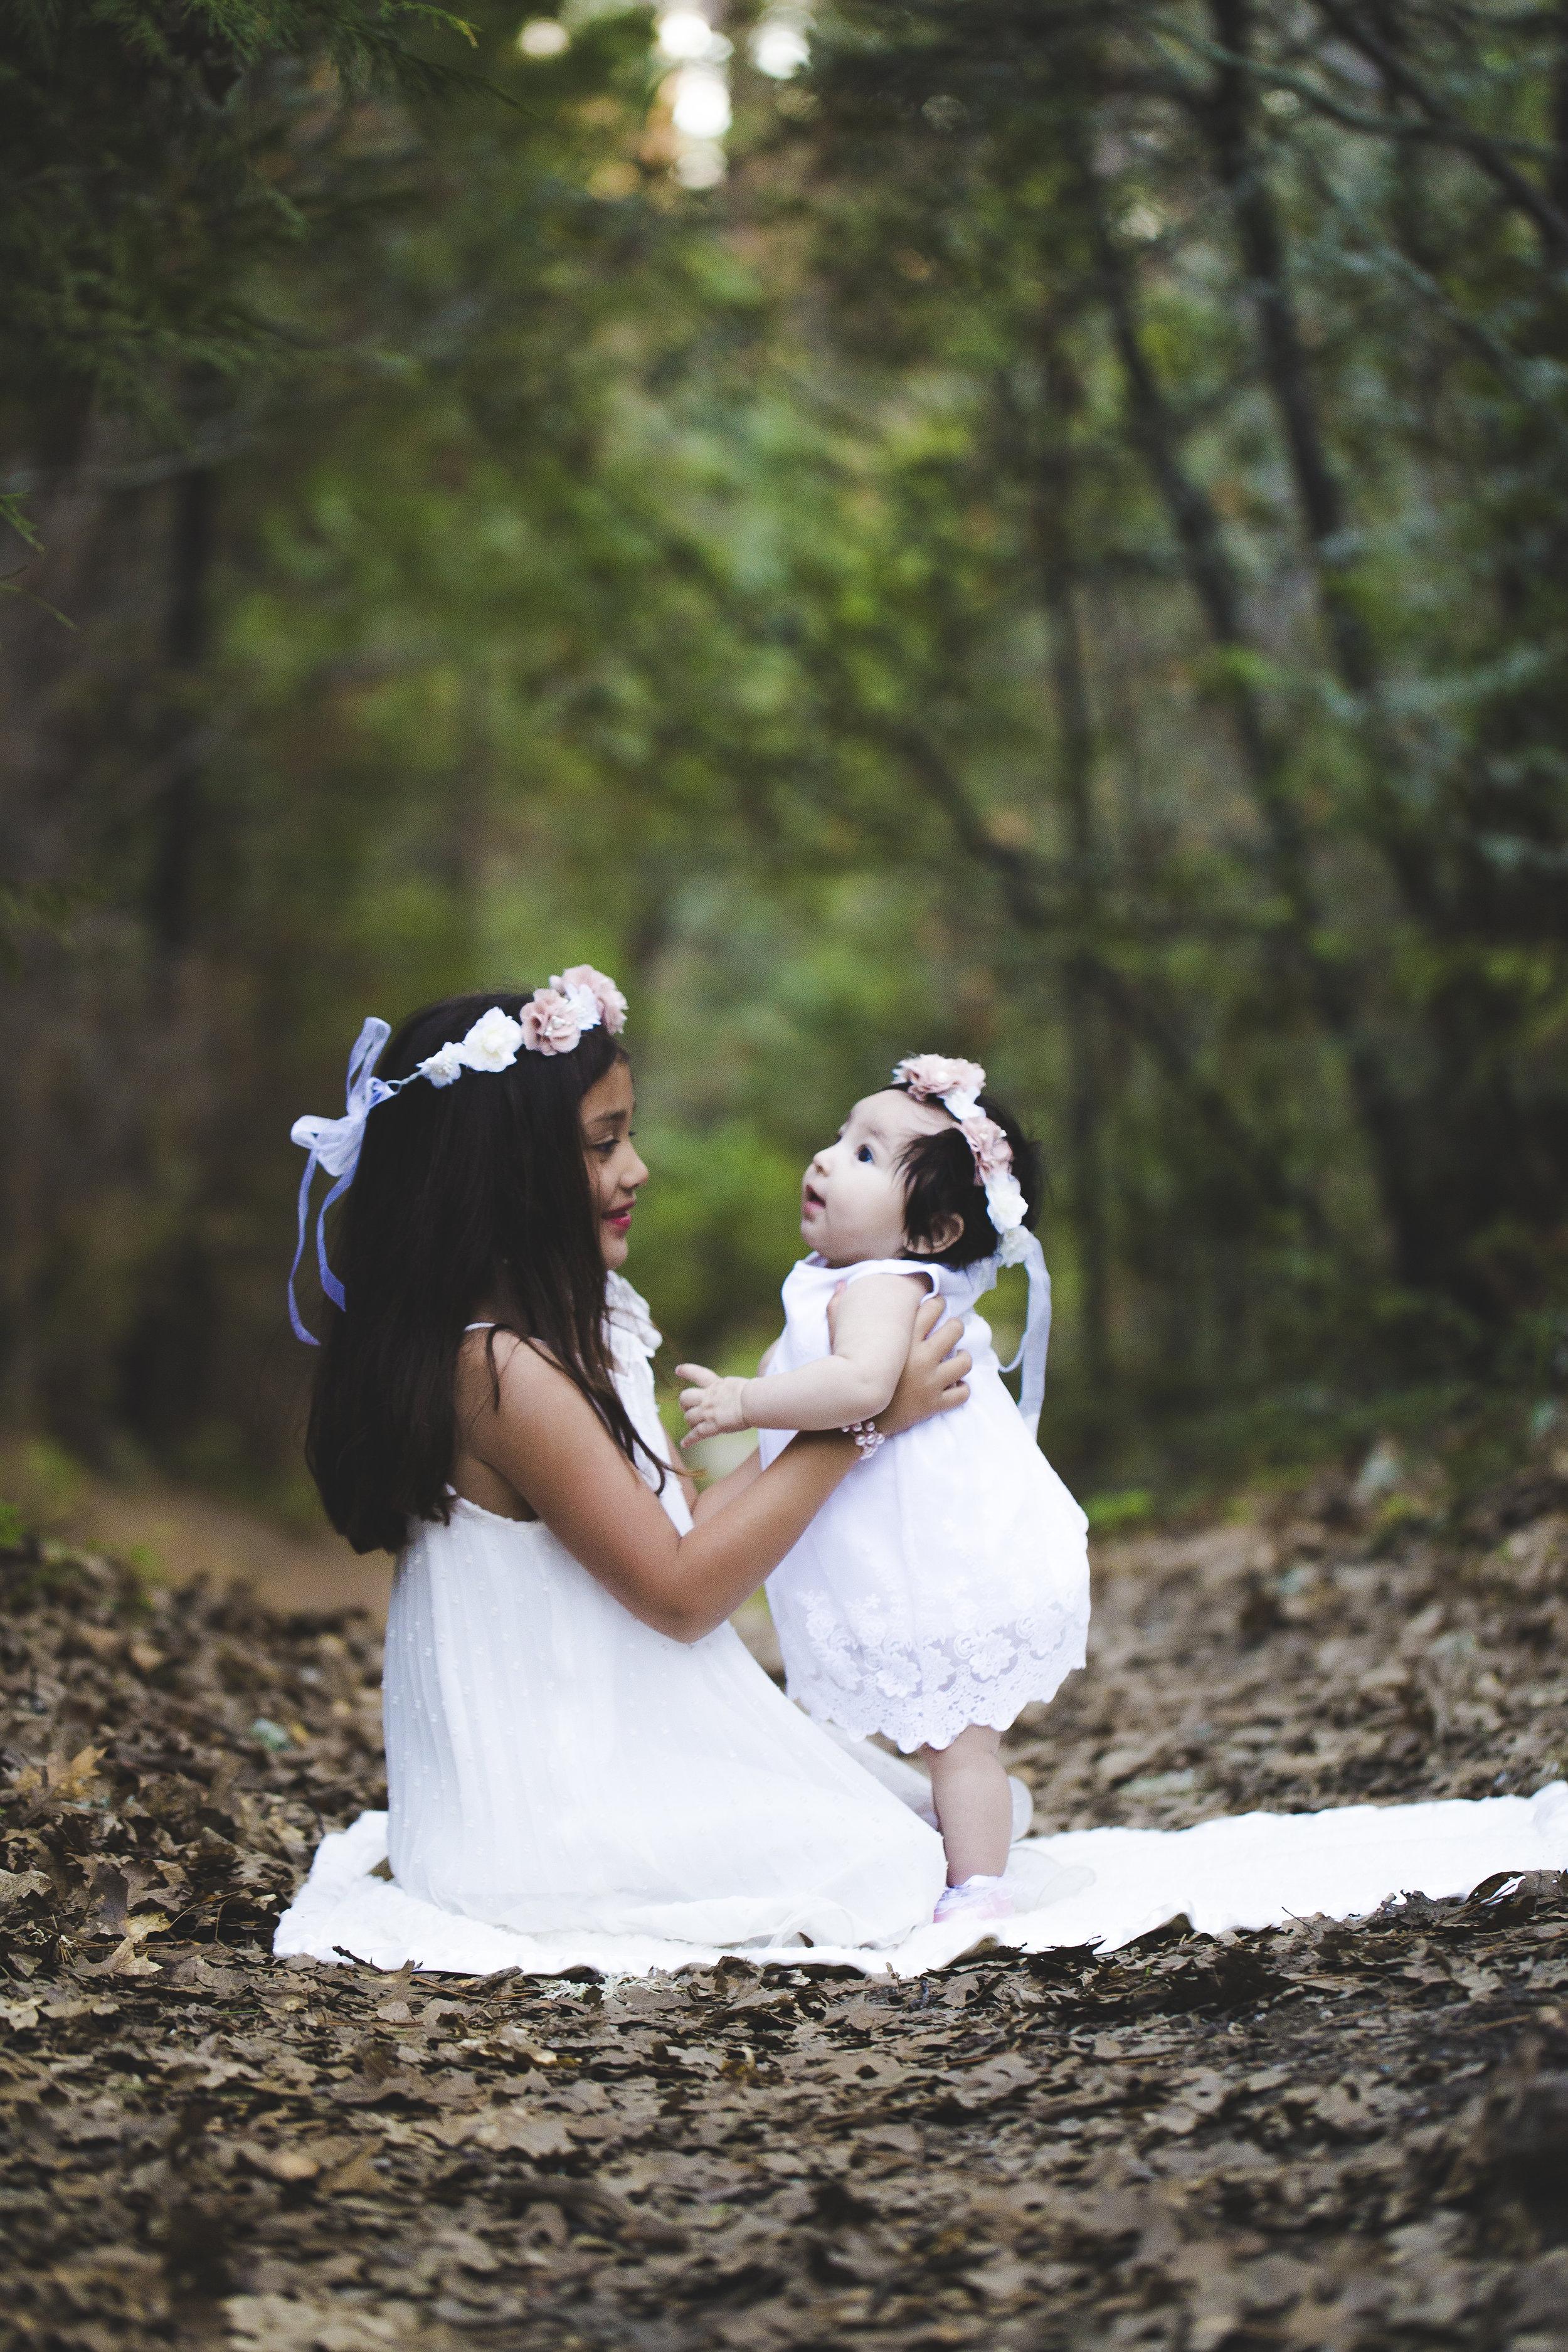 SisterPortraits_2016-17.jpg